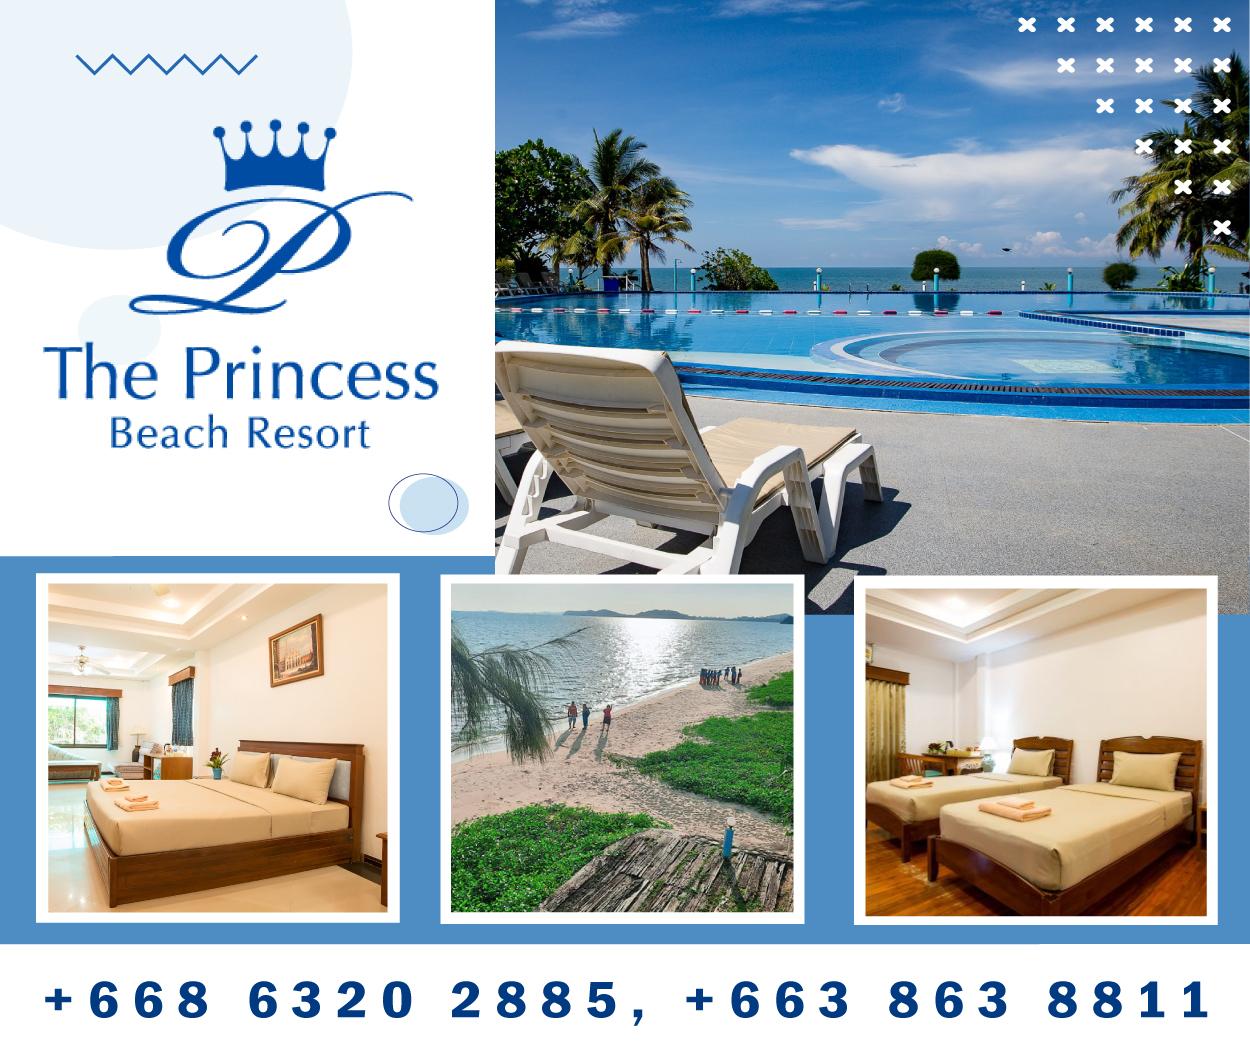 The Princess Beach Resort & Spa